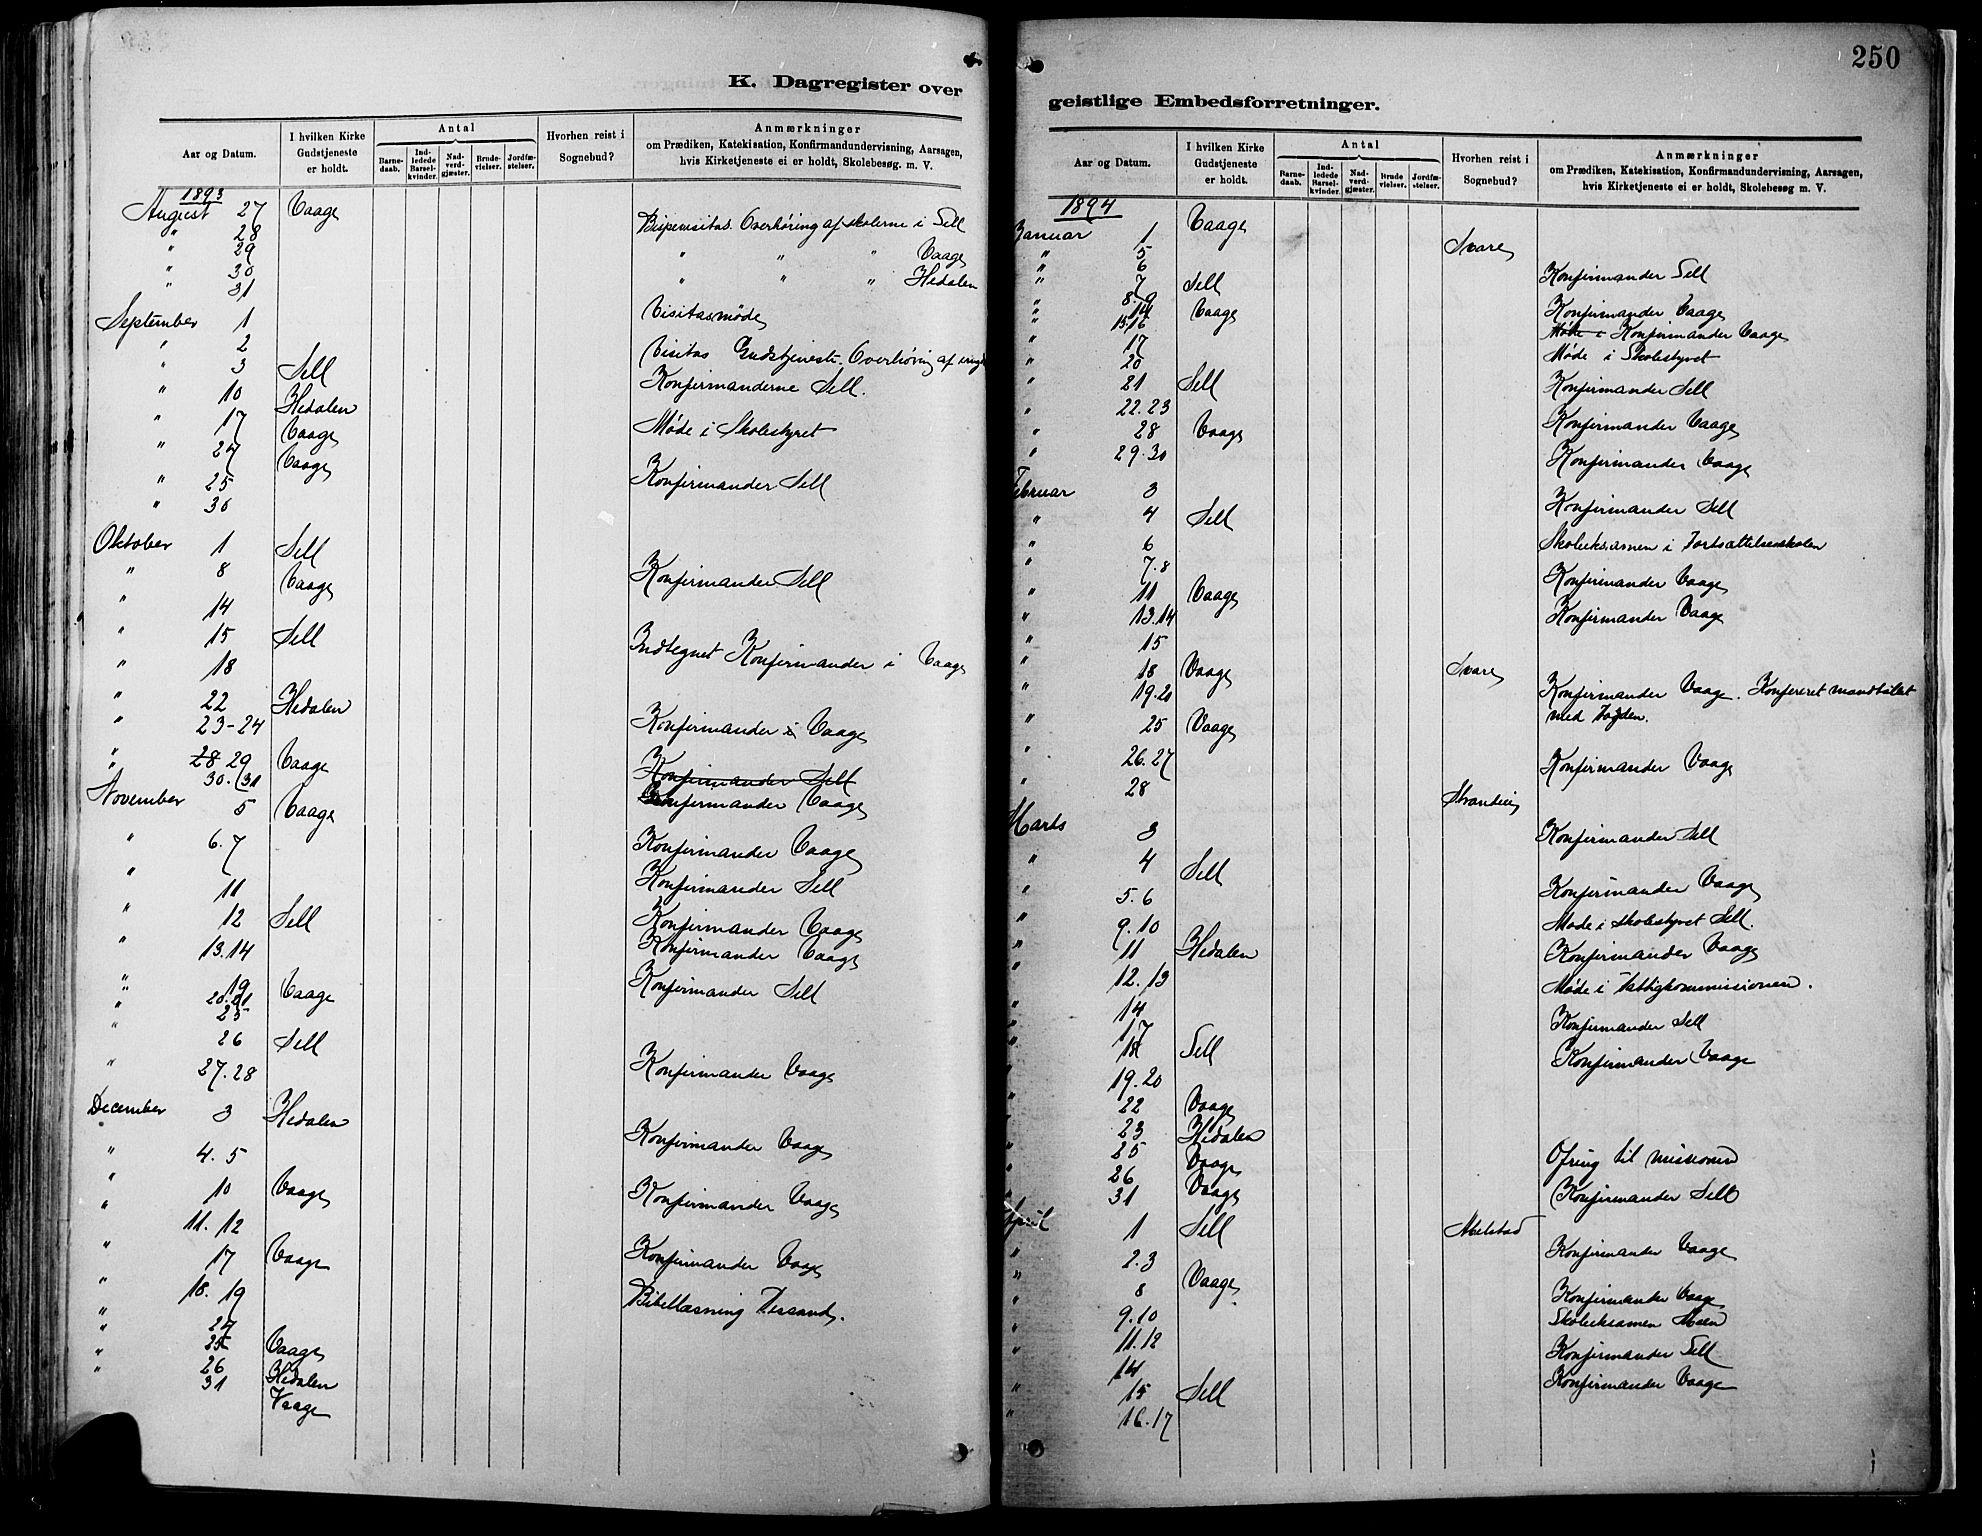 SAH, Vågå prestekontor, Ministerialbok nr. 9, 1886-1904, s. 250